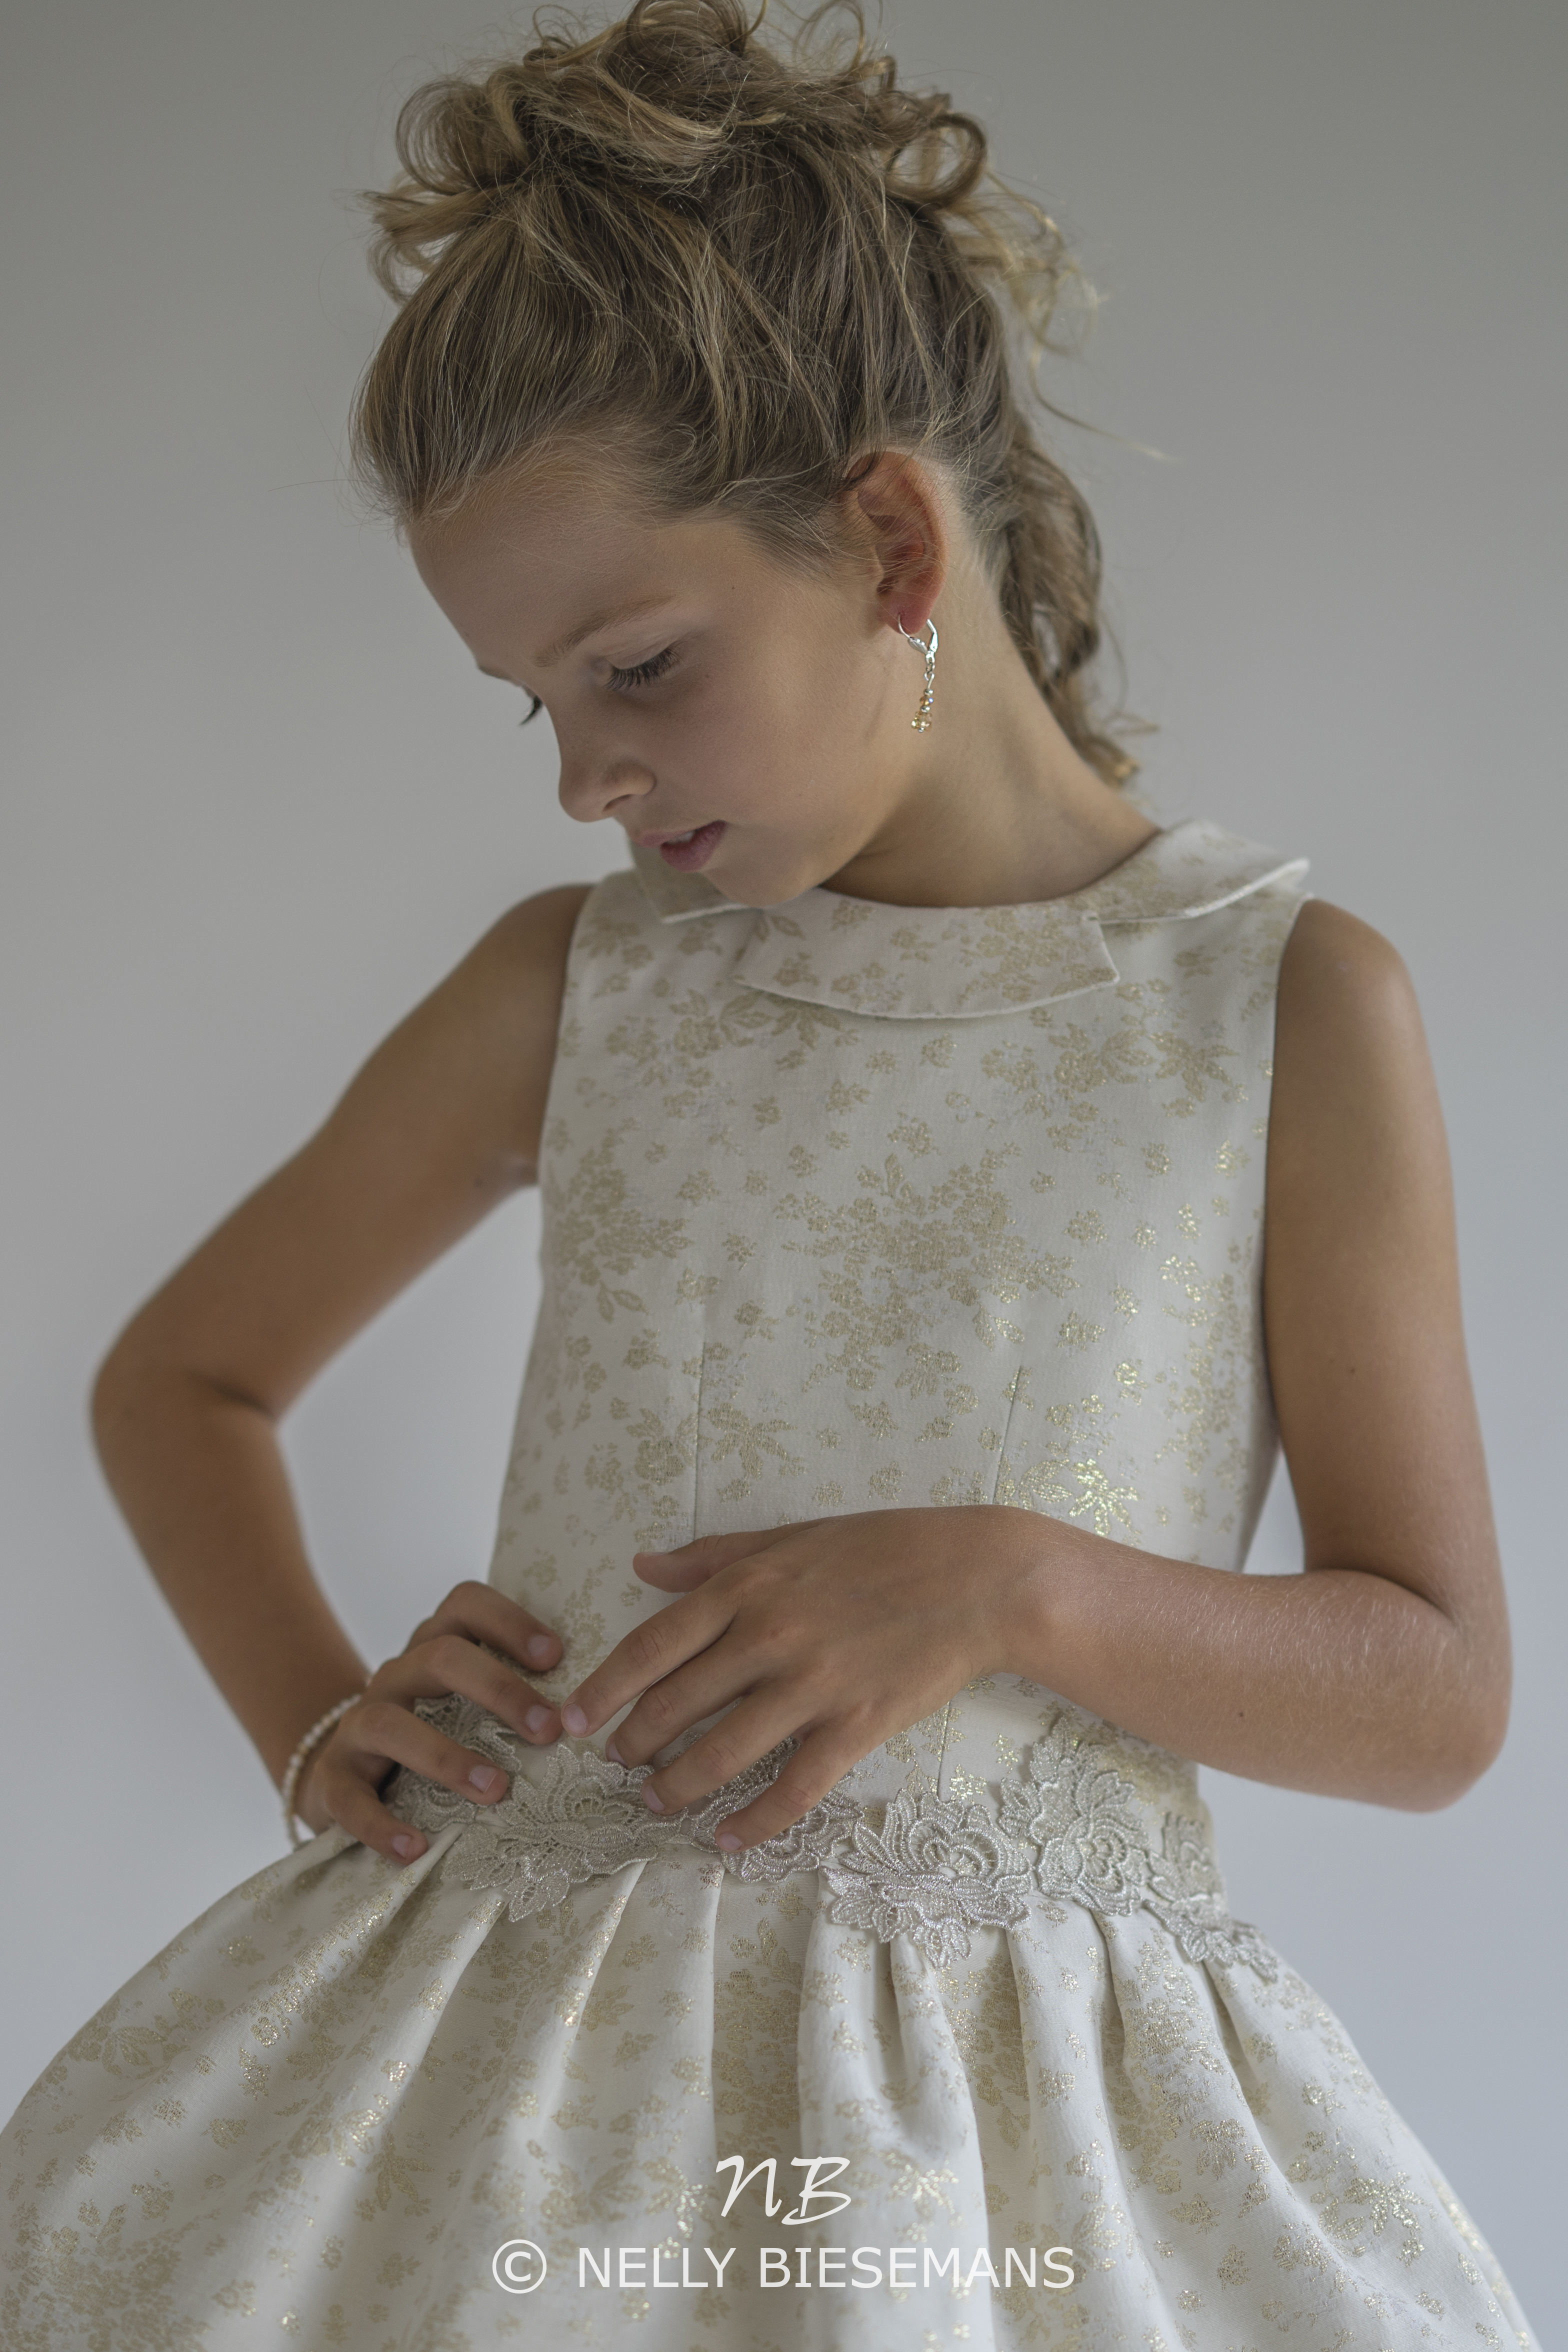 exclusieve communiejurk – bruidsmeisje – vormsel – Nelly Biesemans – www.nb4kids.com – A19K20(3)